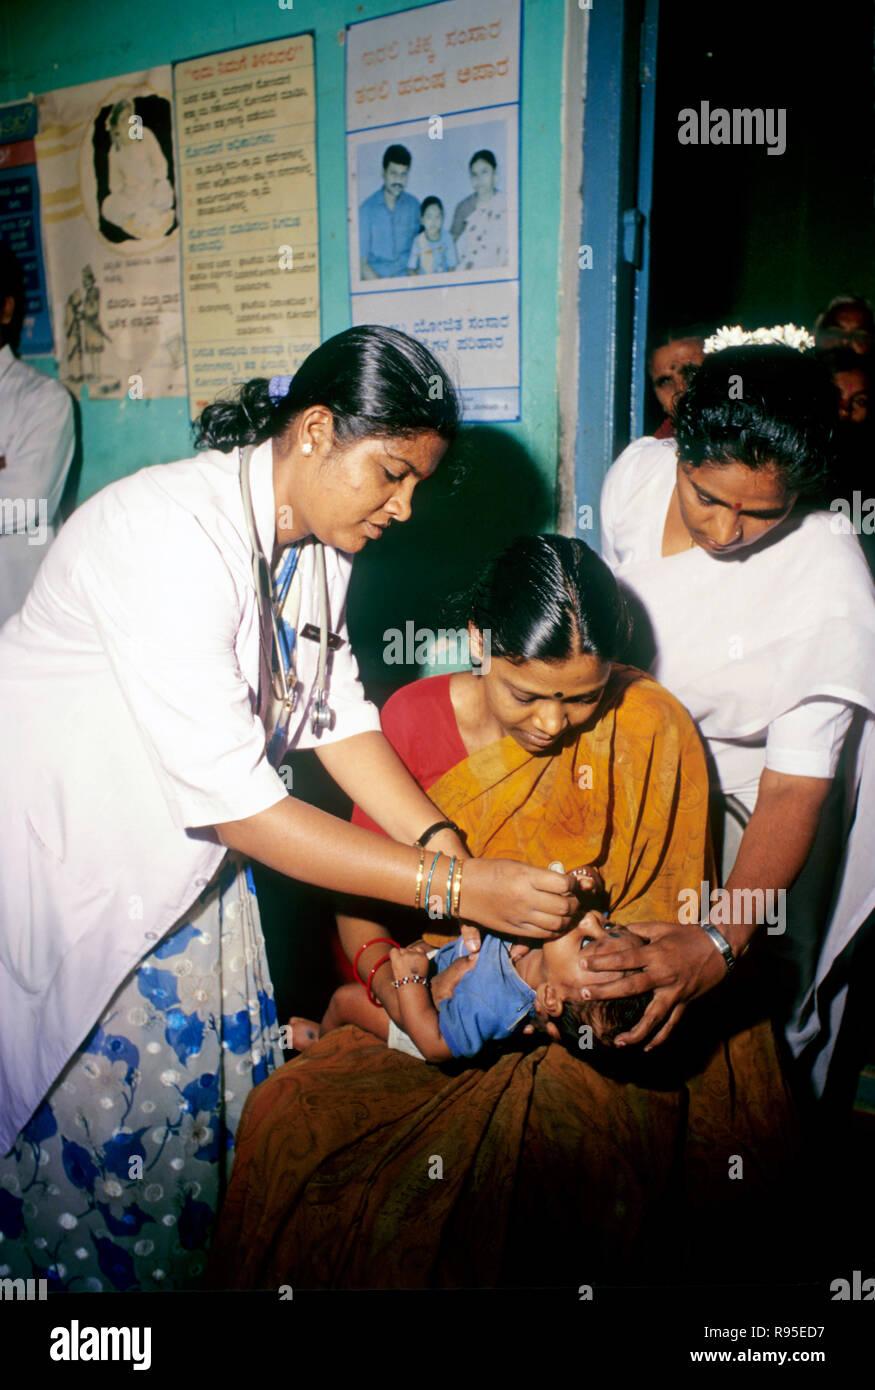 medical center, polio vaccination program - Stock Image